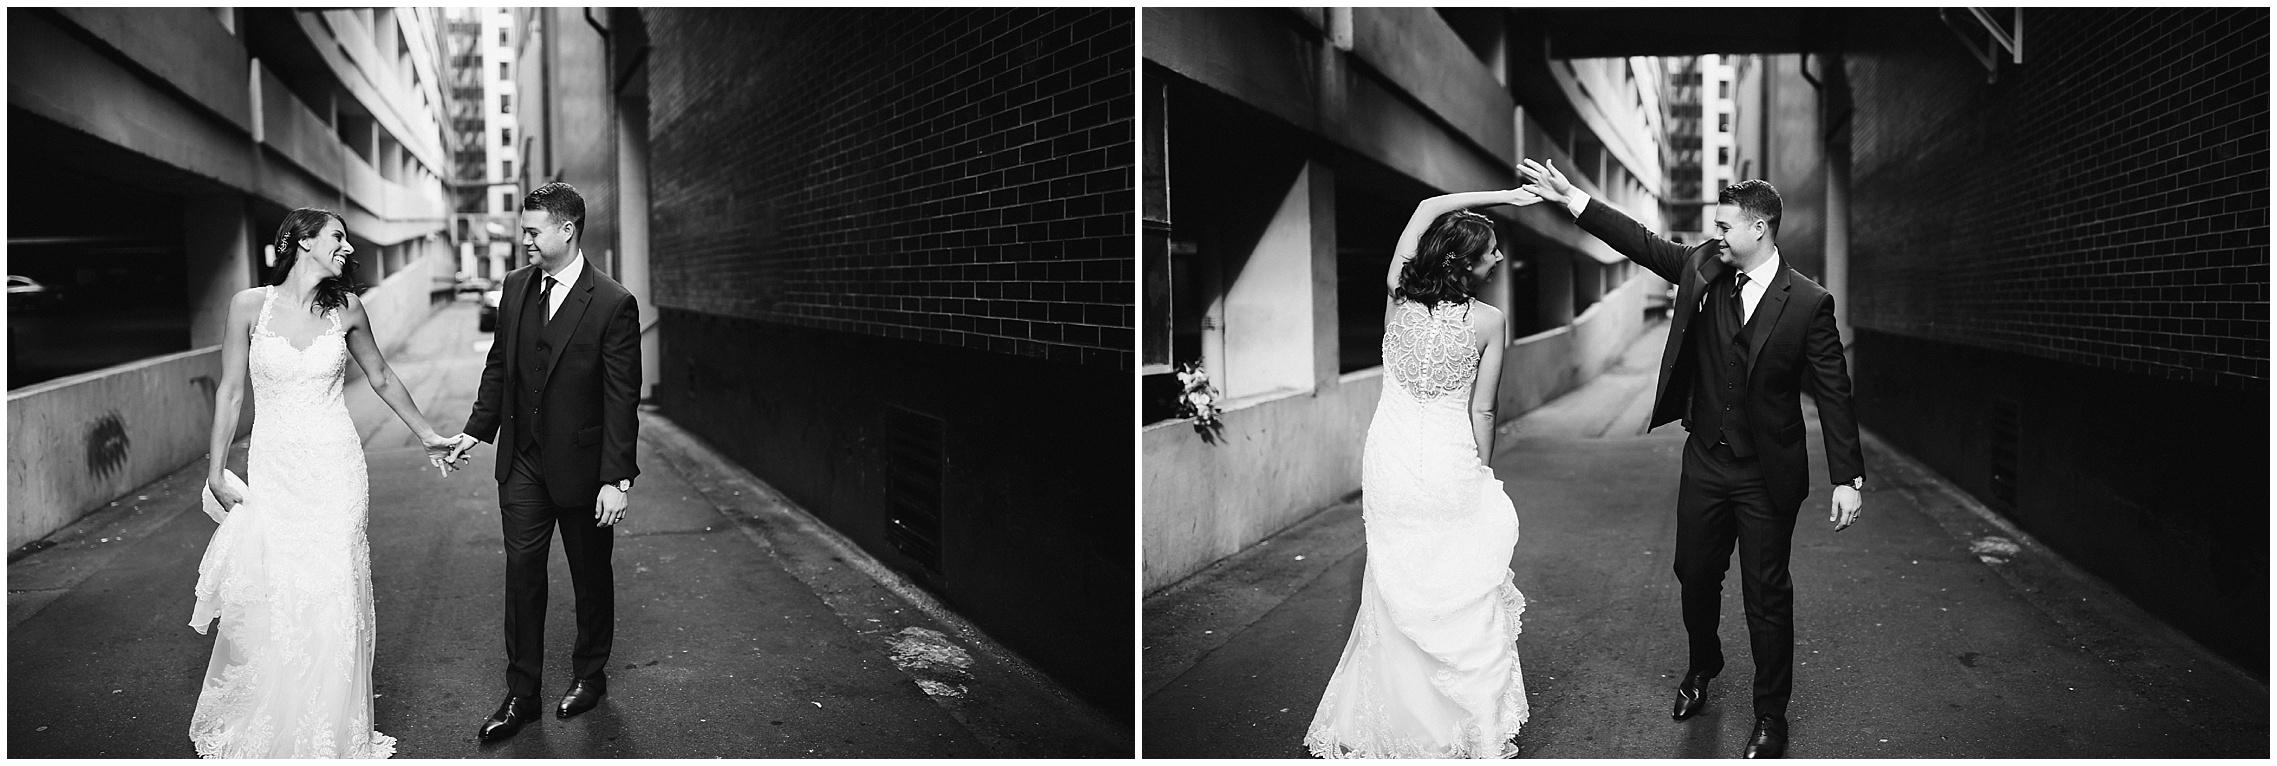 mint_museum_charlotte_wedding_photographer_0399.jpg